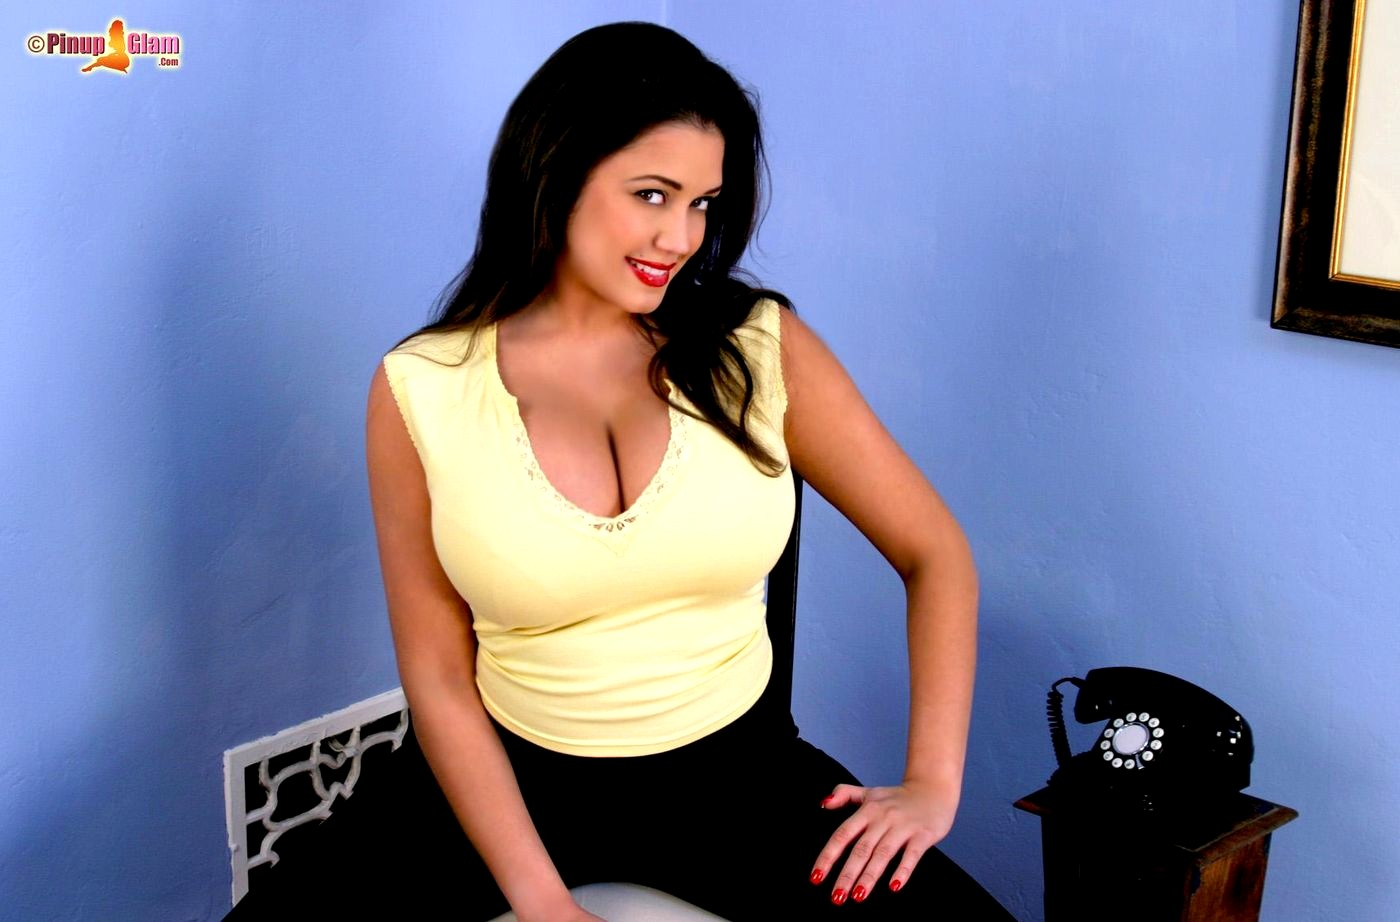 Miriam gonzalez tits in blue shirt fuck video